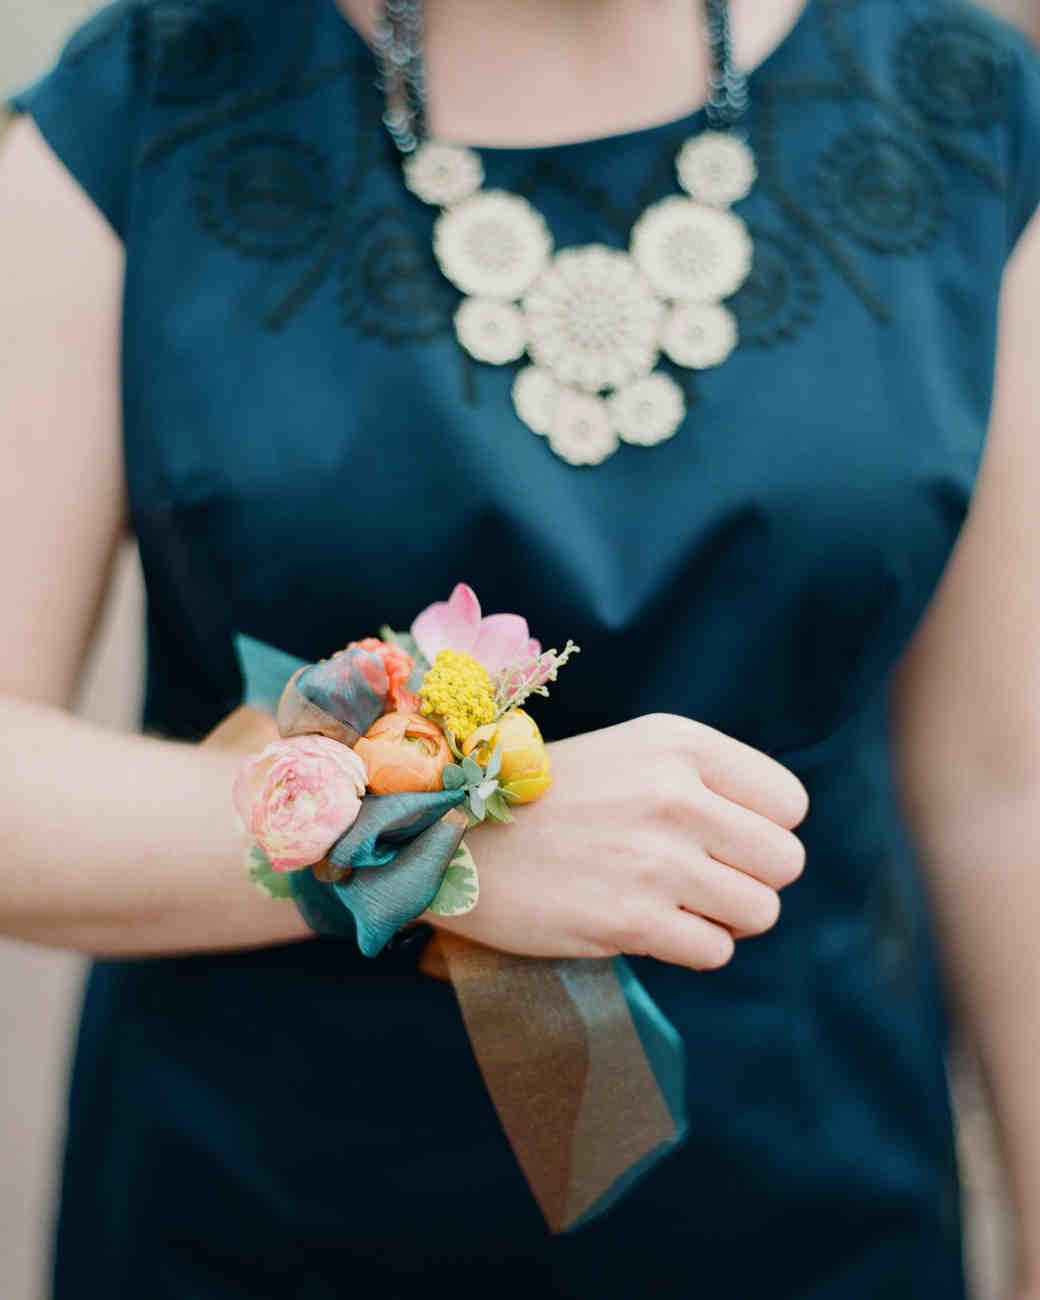 celeste-elizabeth-wedding-corsage-0514.jpg